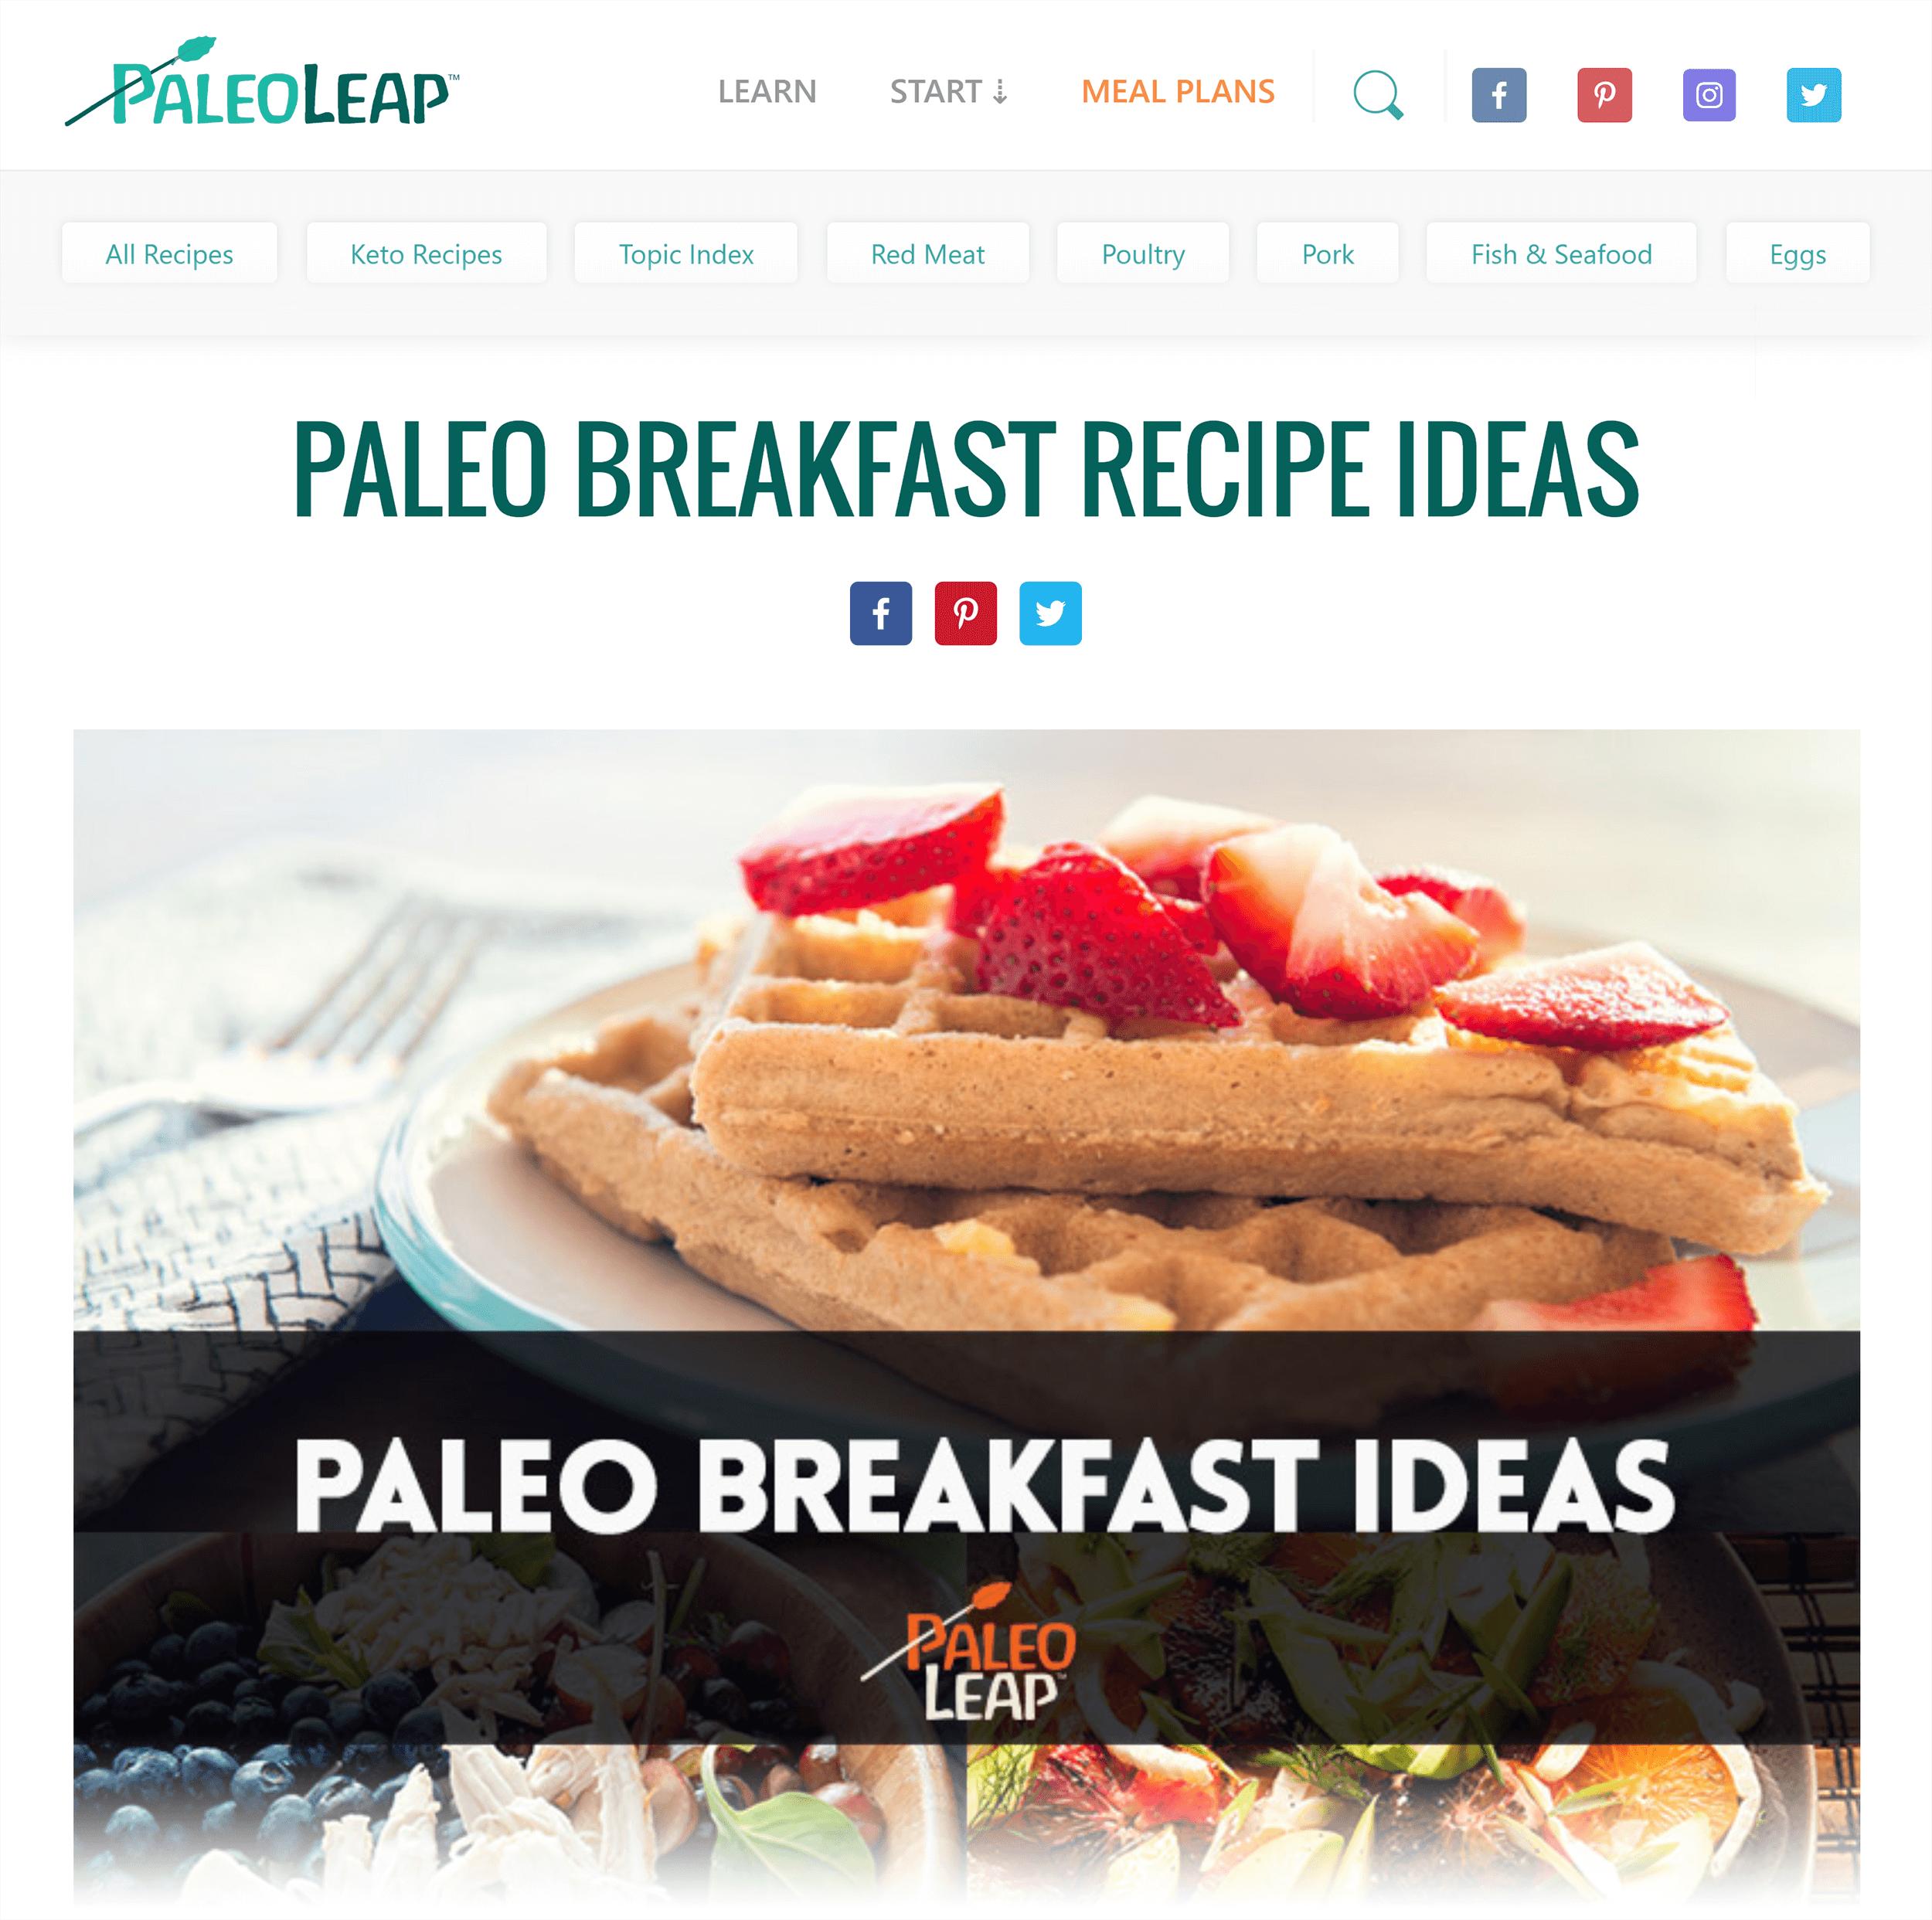 PaleoLeap – Paleo breakfast ideas post